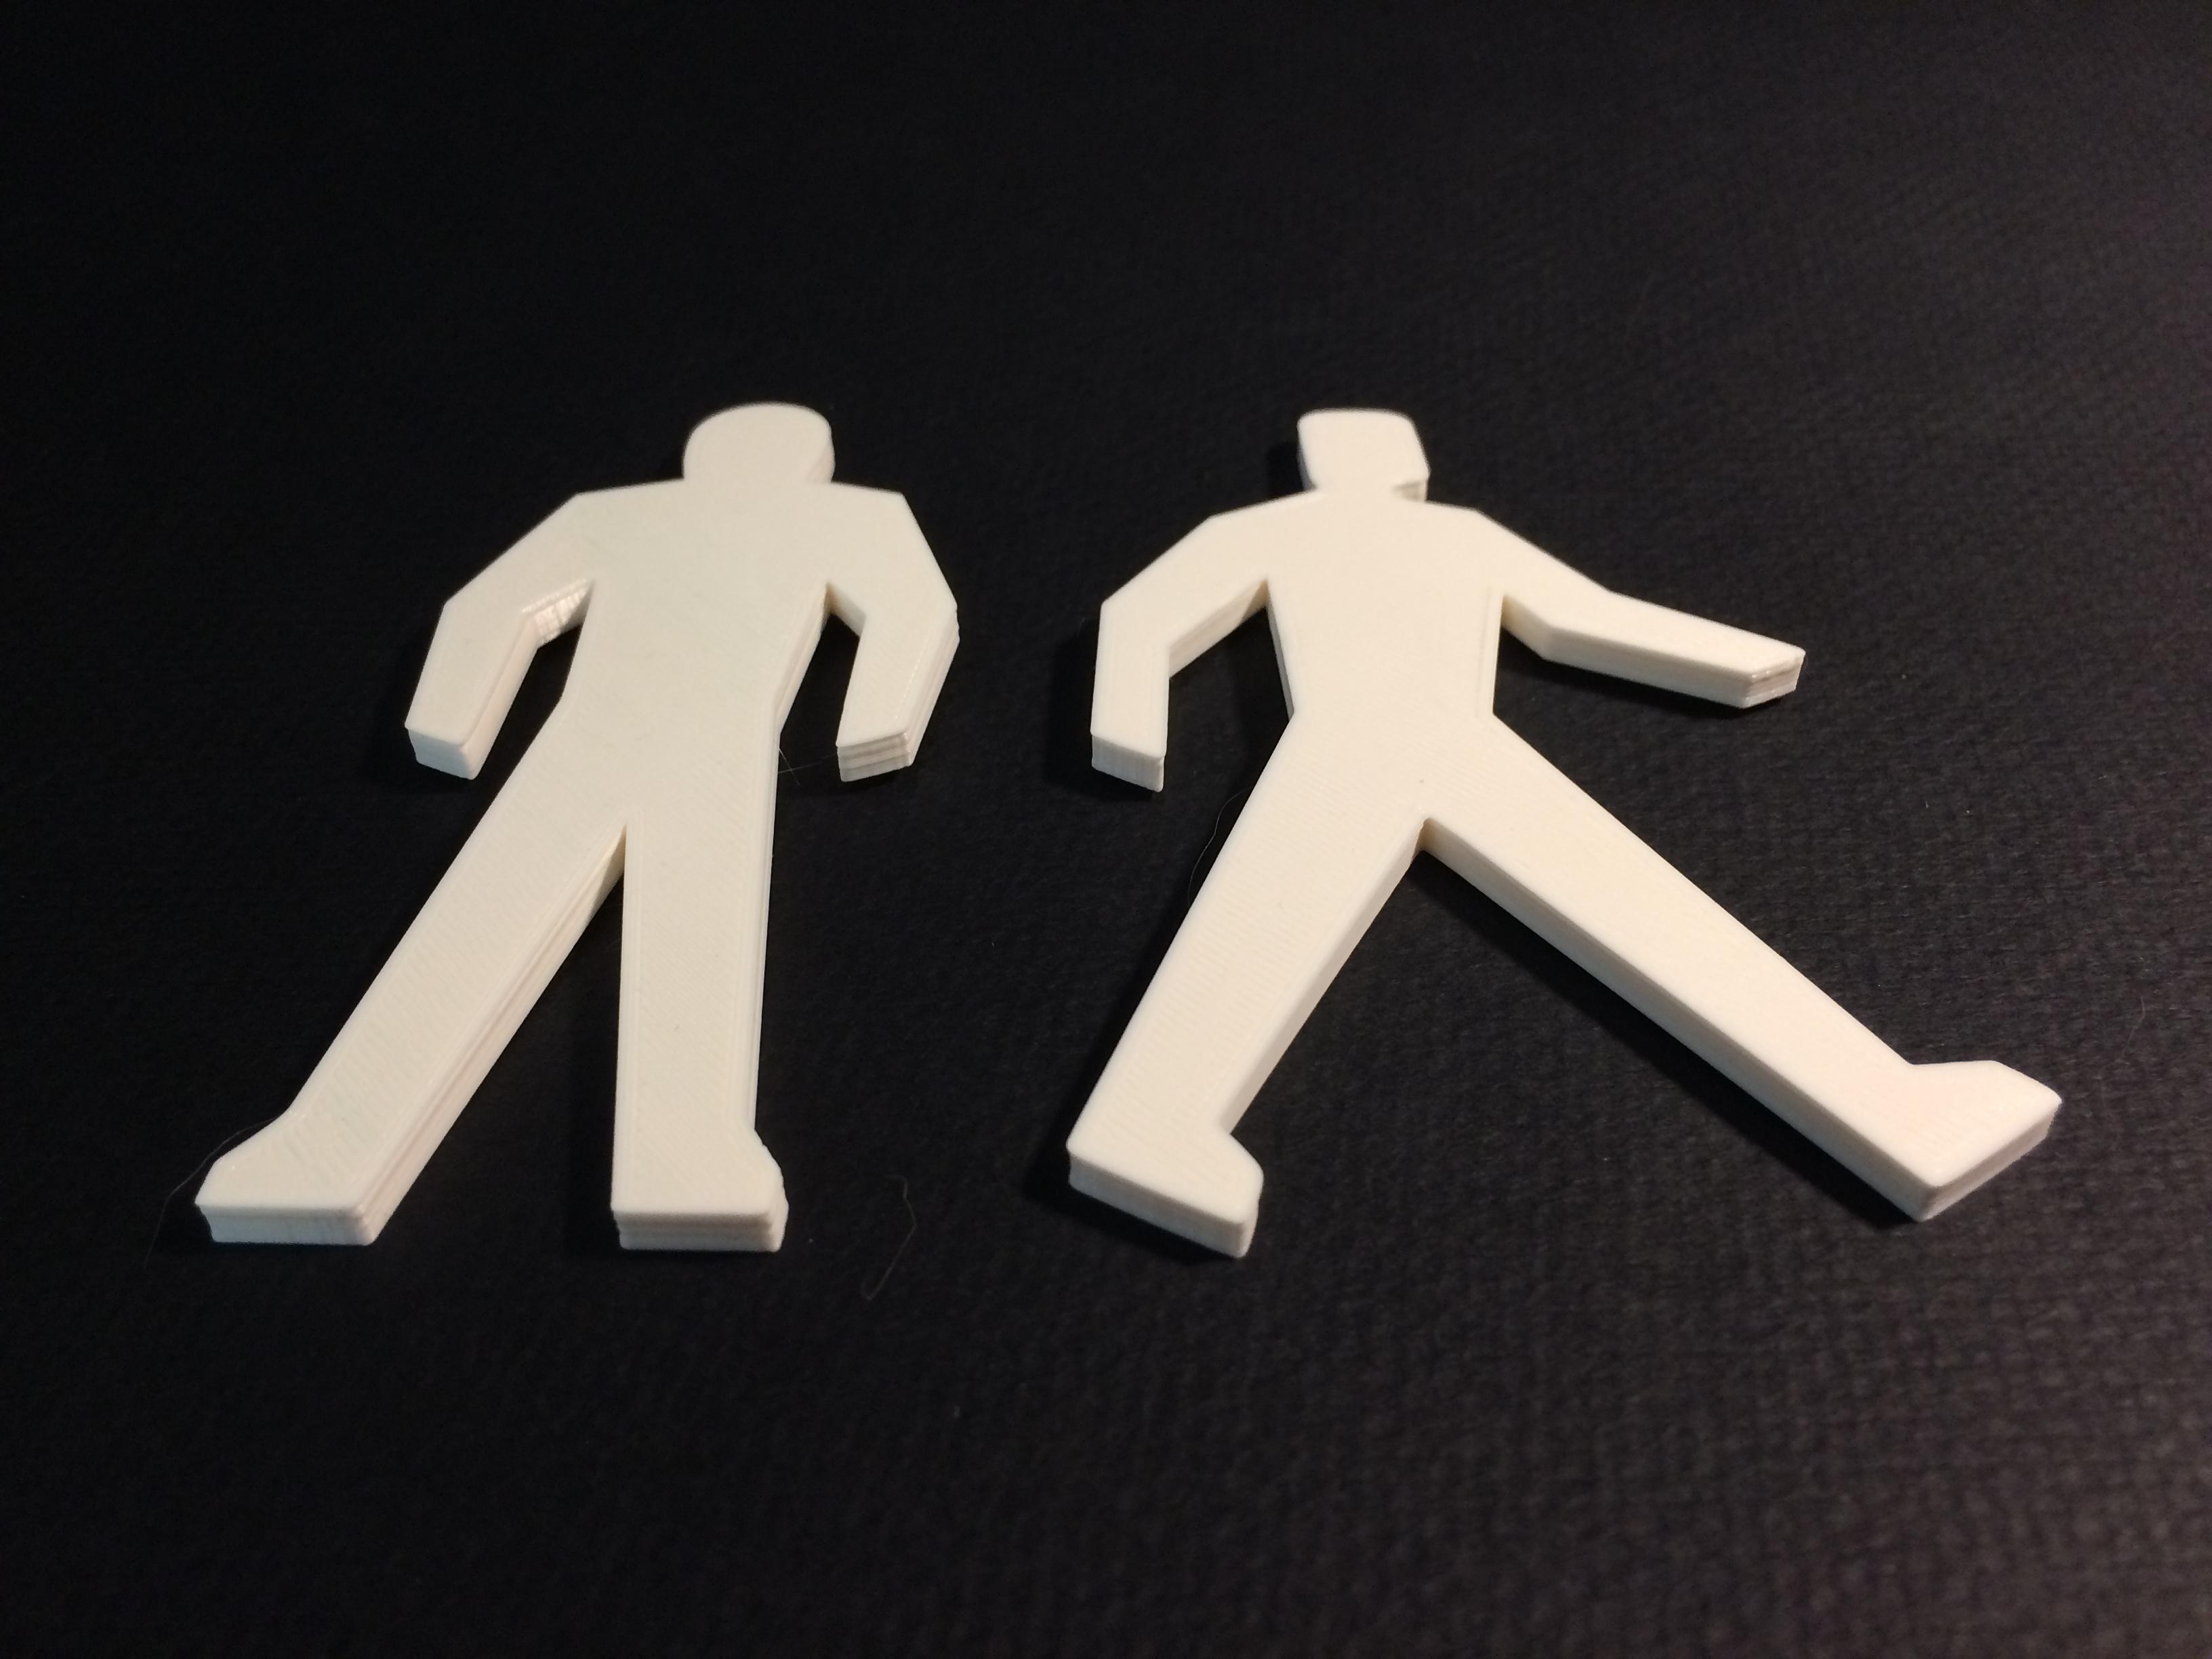 'Don't Walk' & 'Walk' Symbols image